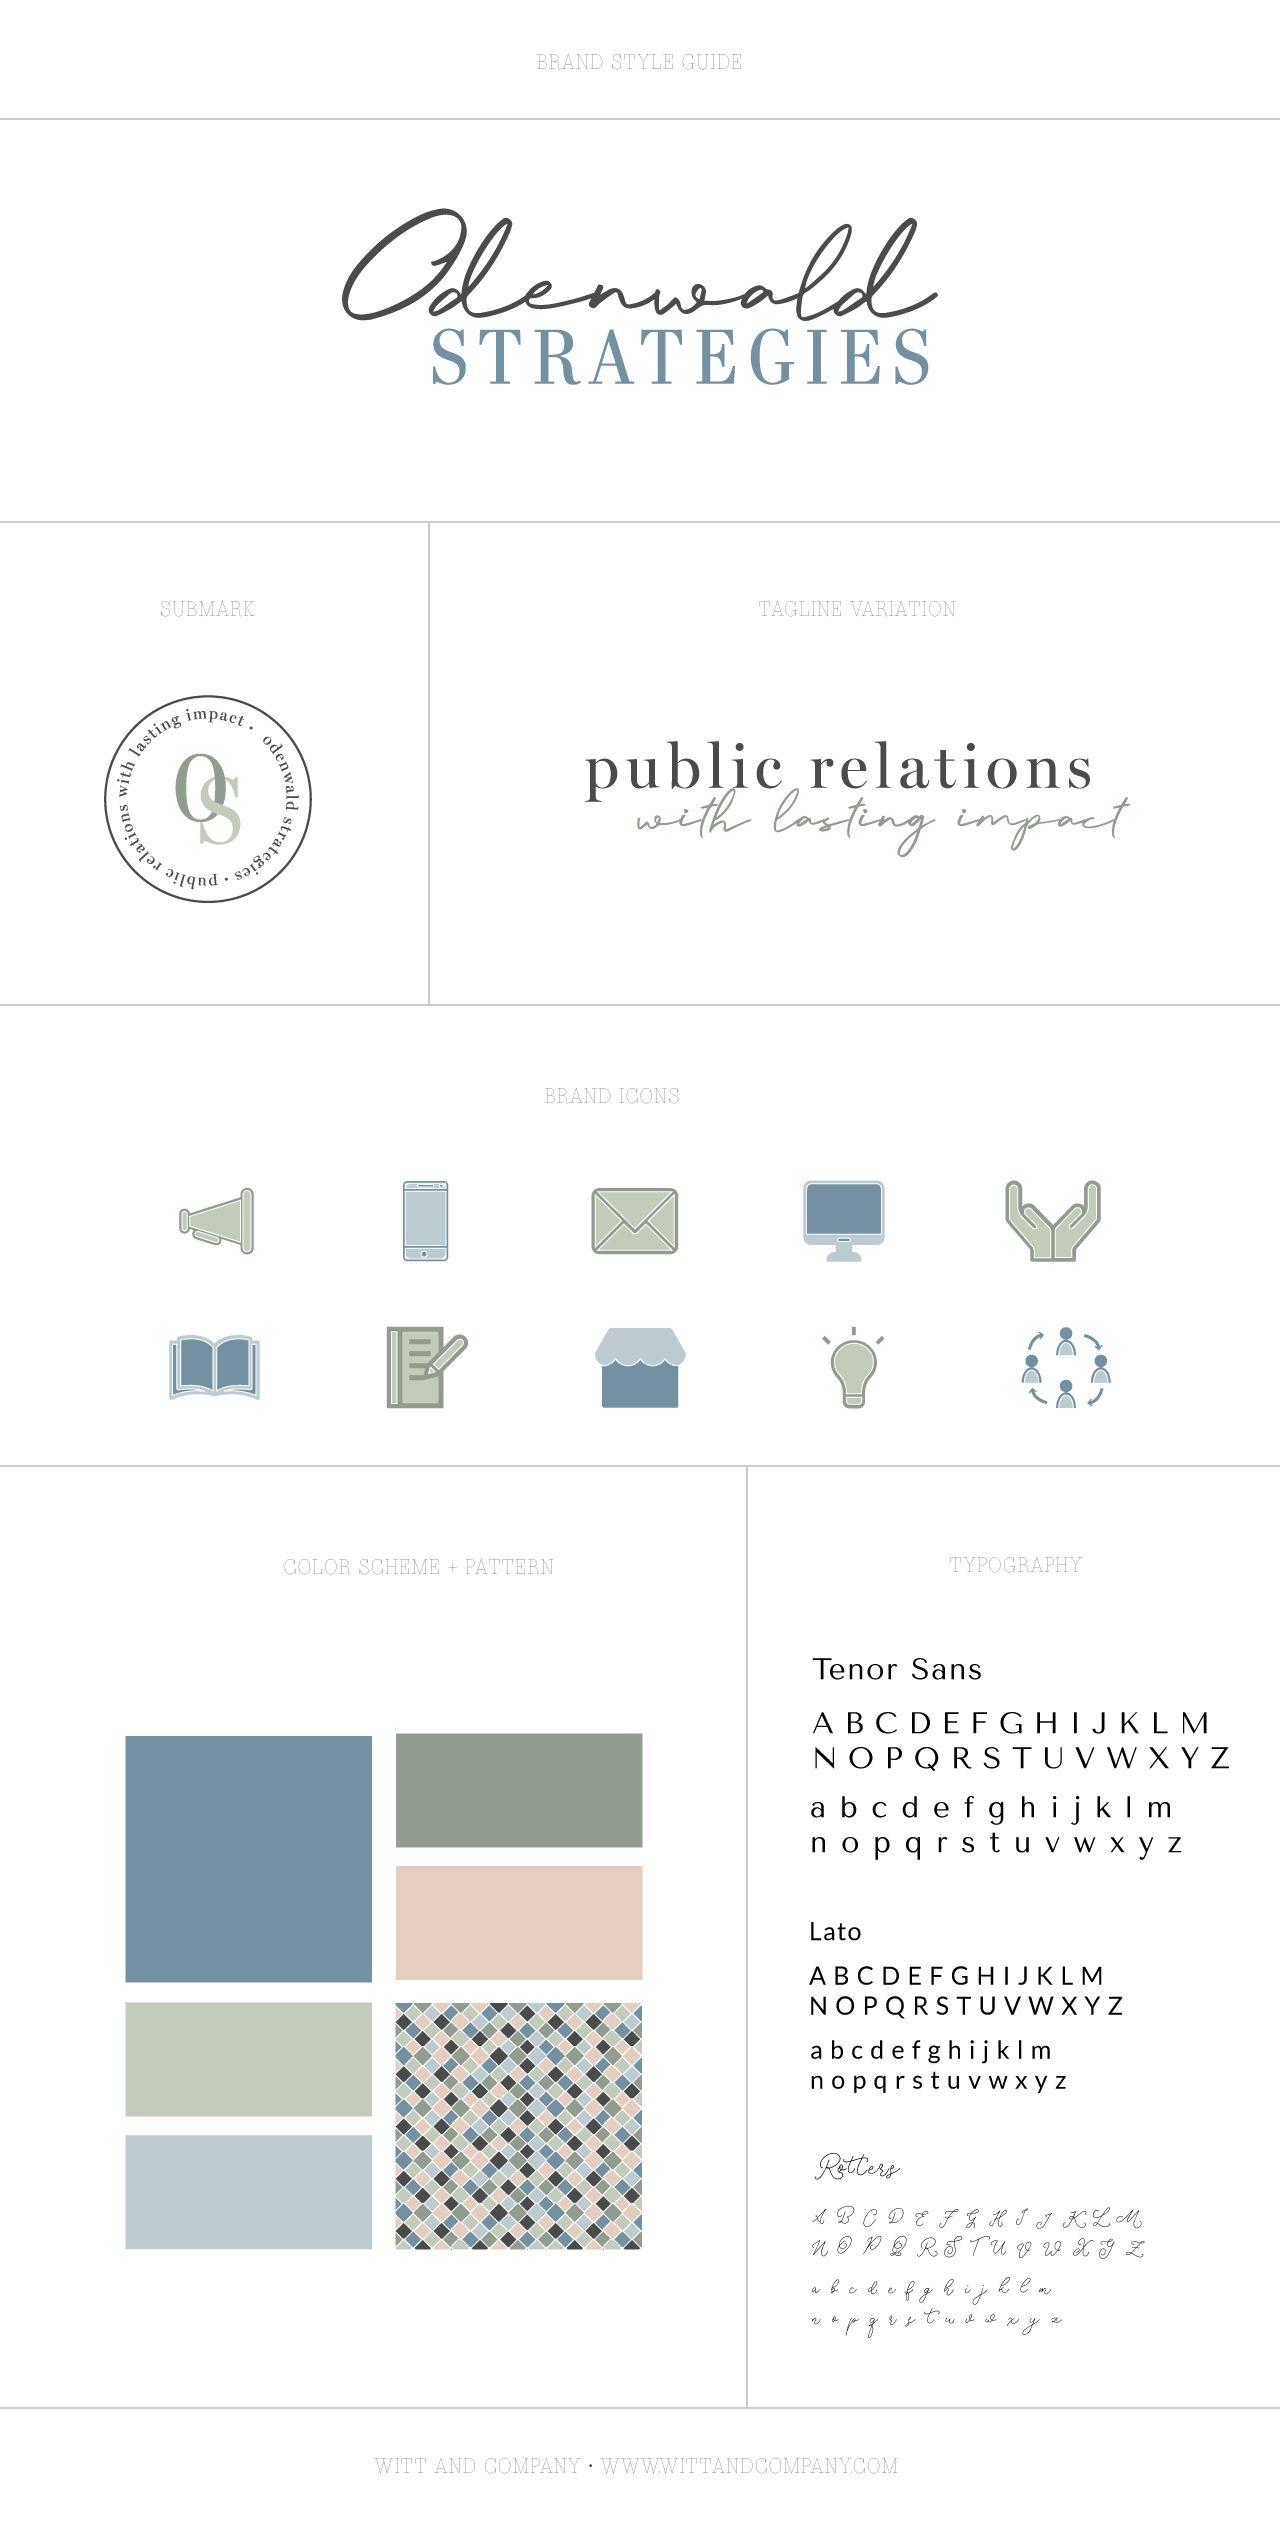 Odenwald Strategies Brand Design Reveal Witt And Company Visual Brand Design For Cons In 2020 Logo Branding Board Branding Design Brand Inspiration Board